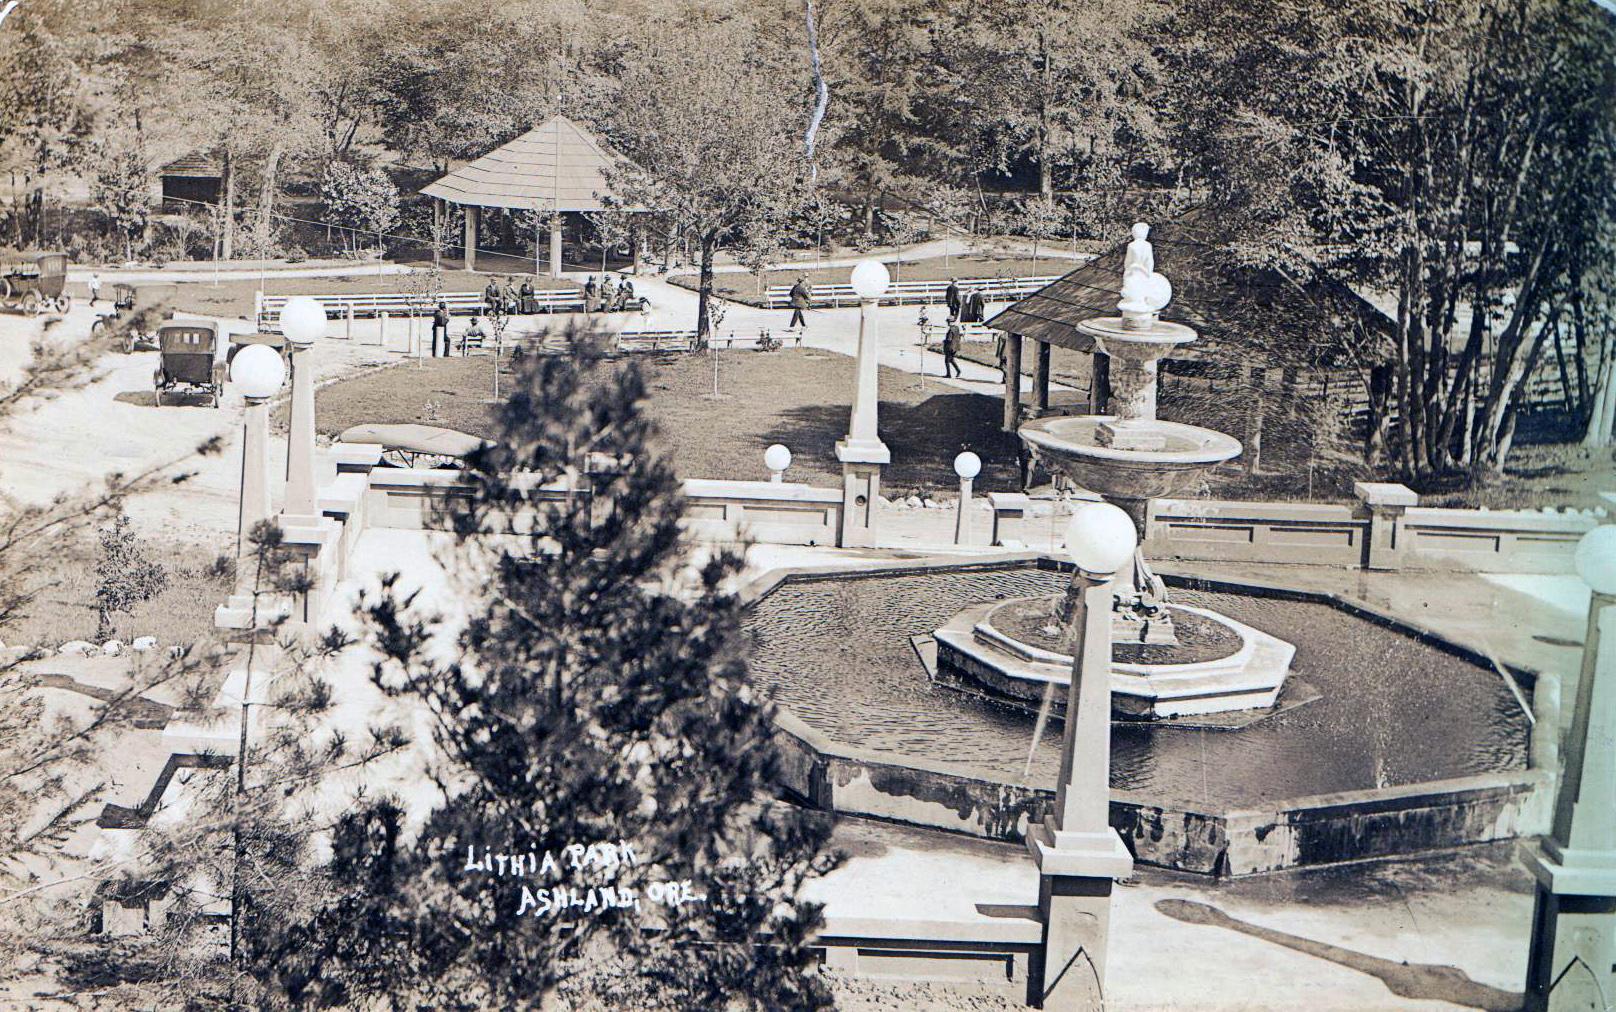 Butler_Perozzi_Fountain_Ashland_OR 1927.jpg.jpeg